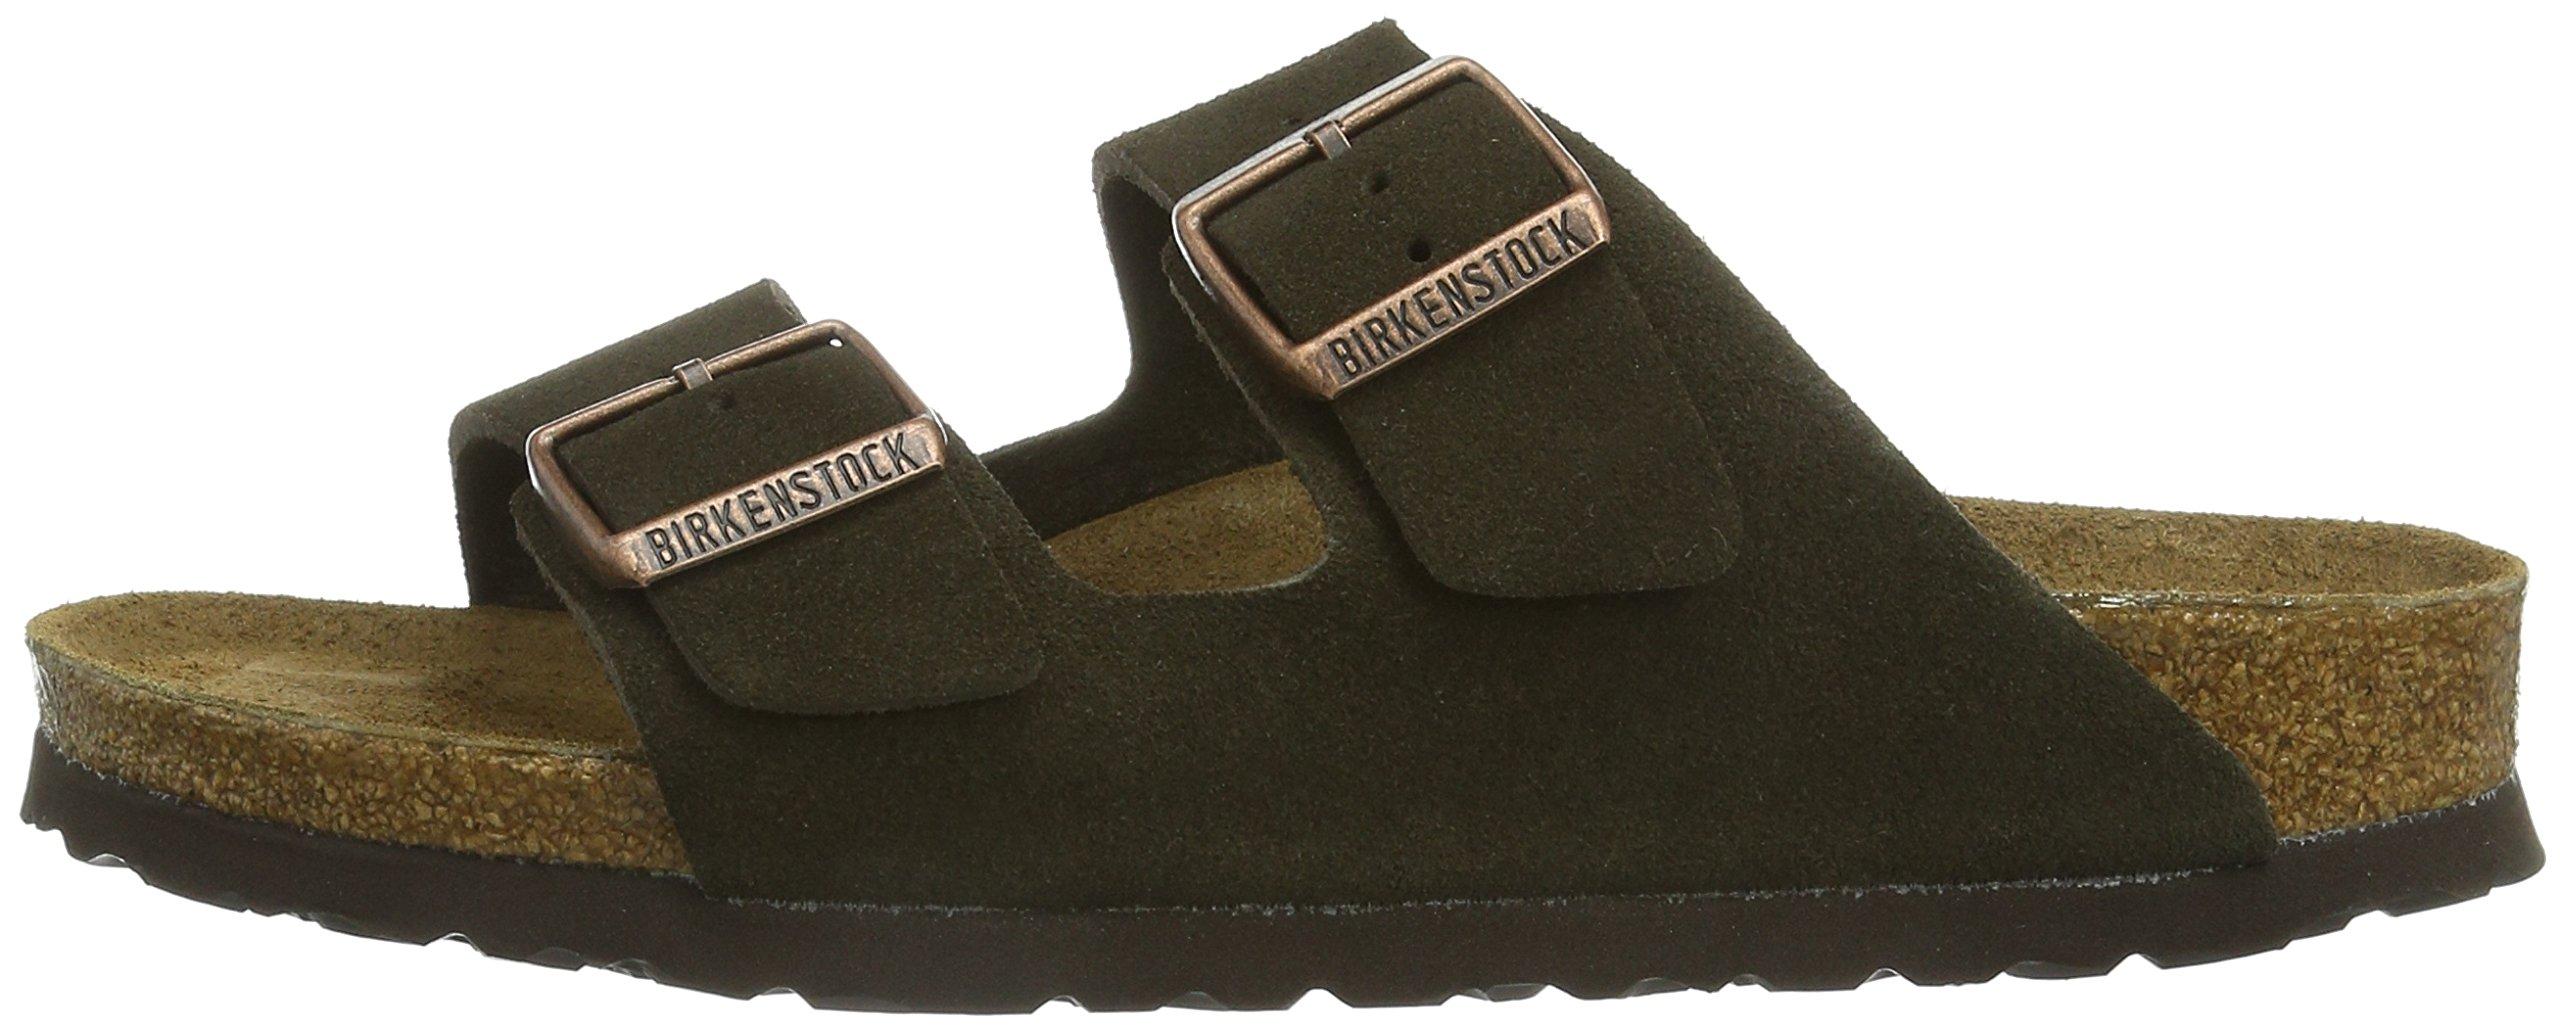 Birkenstock Women´s Arizona Mocha Suede Sandals 37 N EU N 951313 by Birkenstock (Image #5)